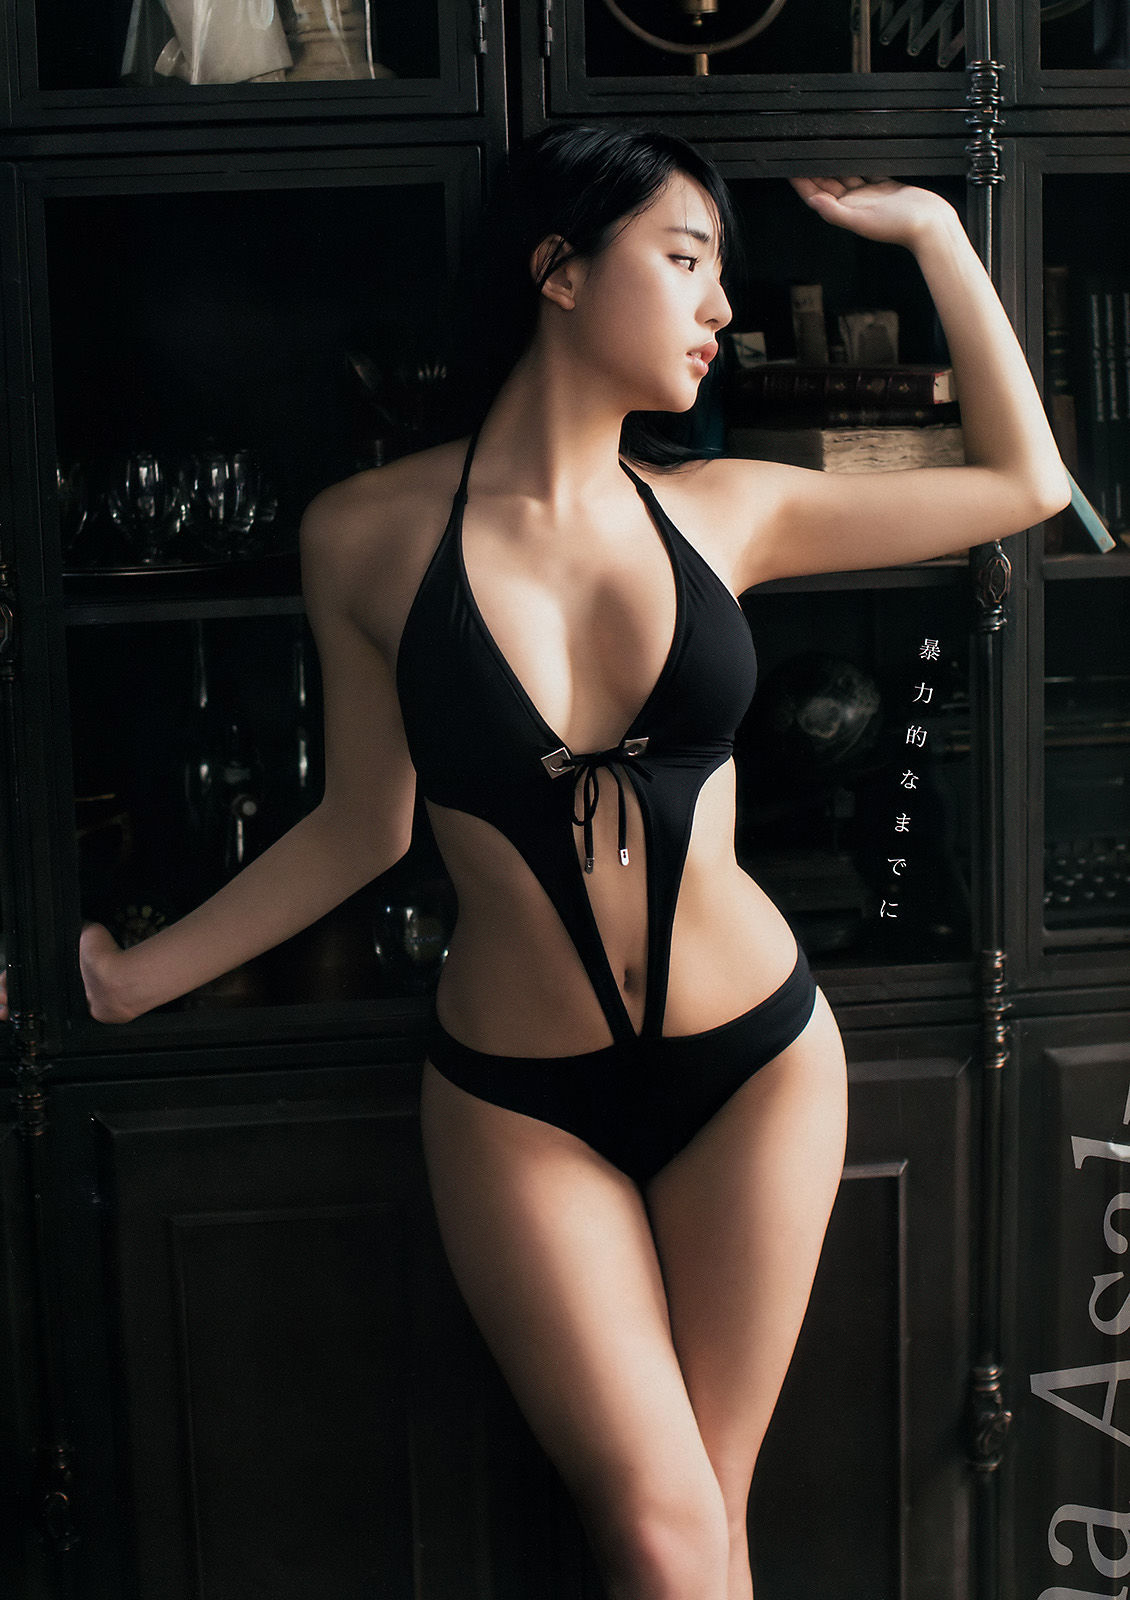 VOL.7 [Young Magazine]美胸大胸:浅川梨奈超高清写真套图(11P)